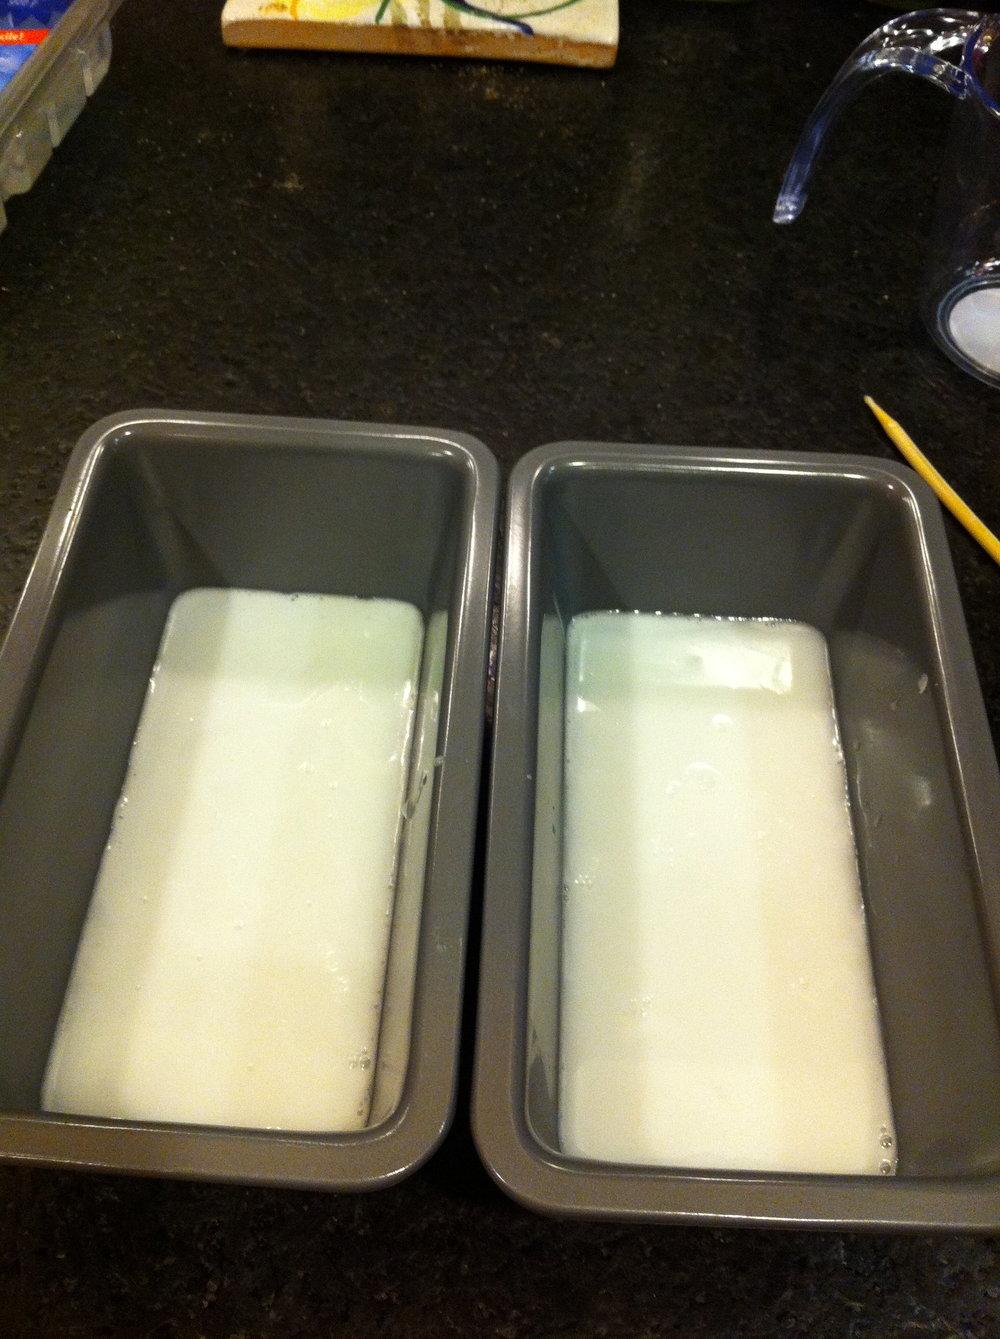 Soap 3.jpg